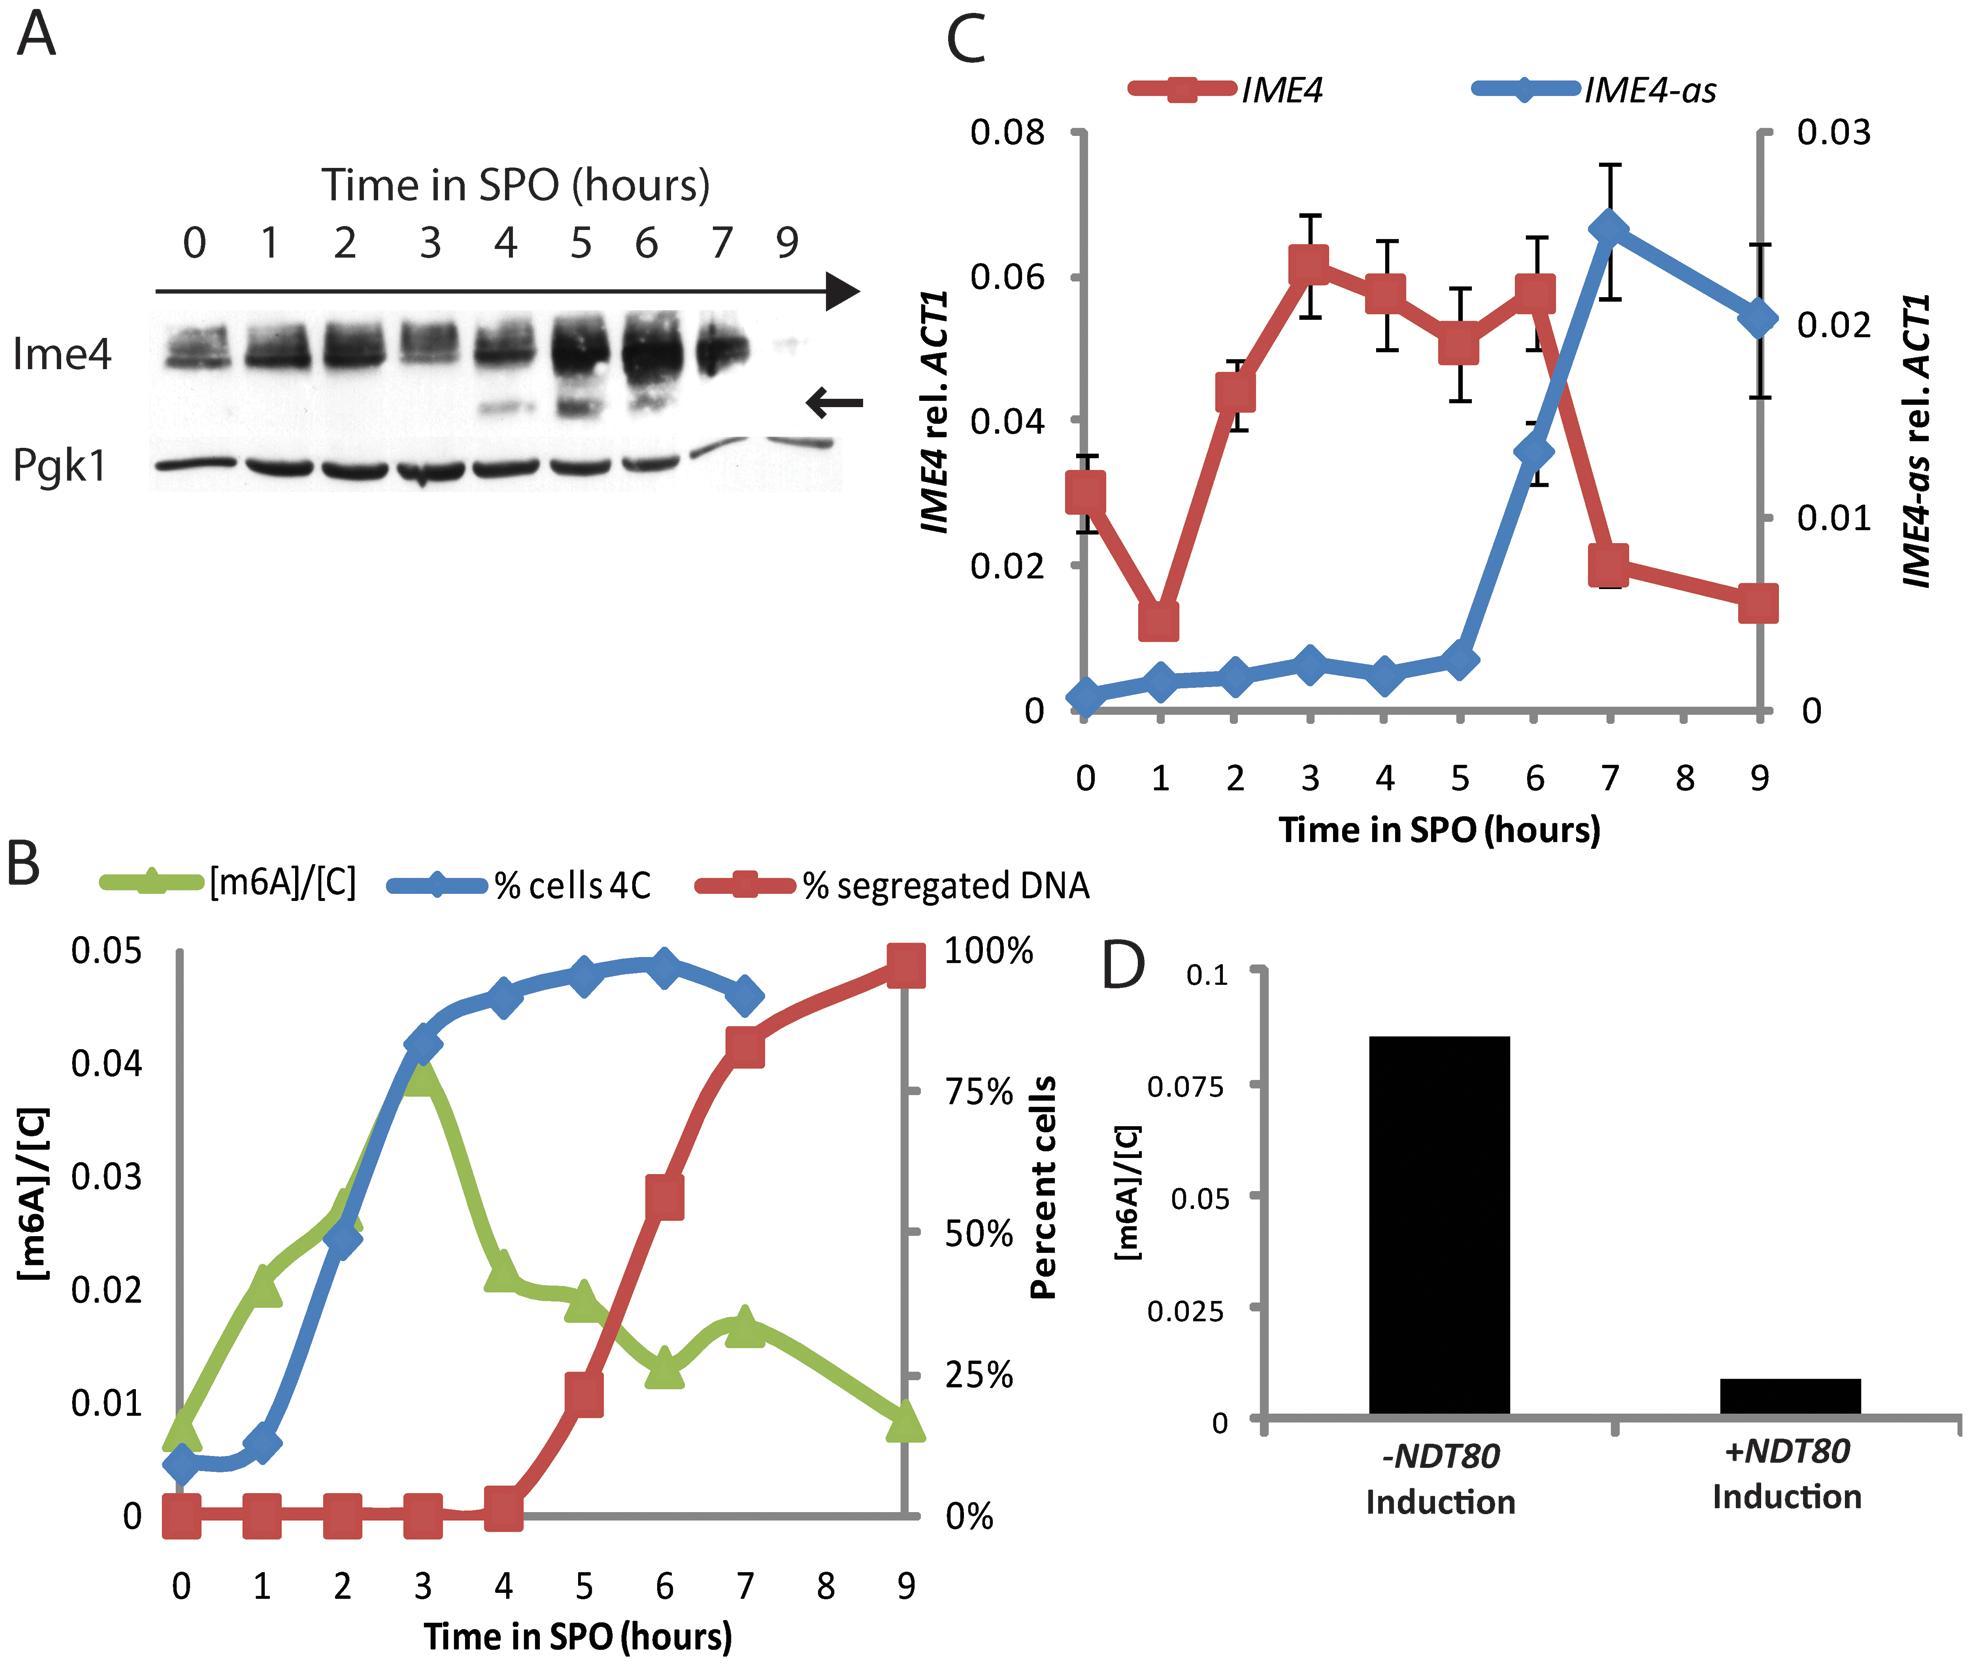 m<sup>6</sup>A accumulates prior to meiotic divisions.